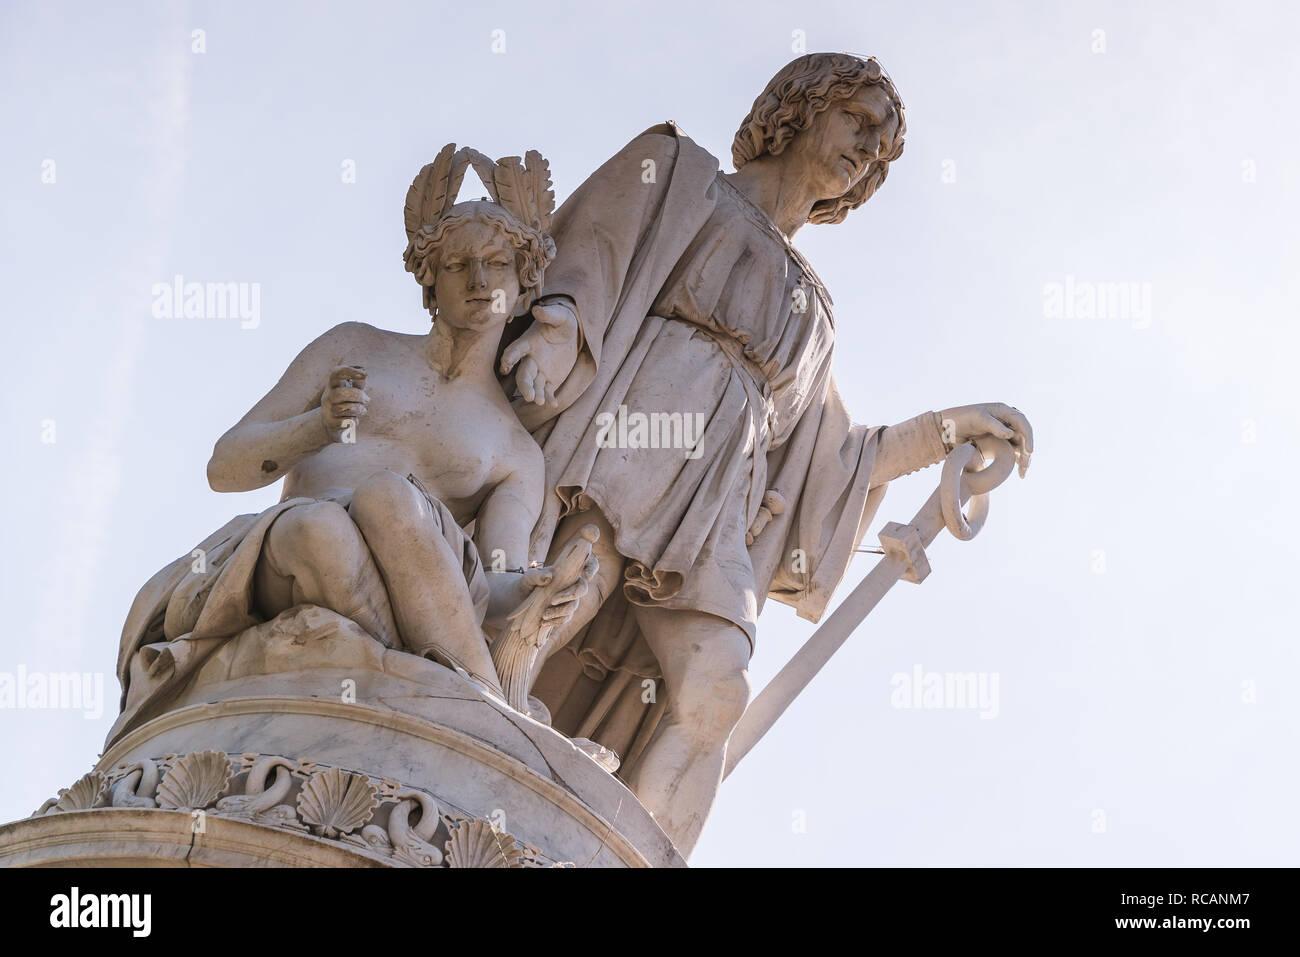 Christopher Columbus Monument on Piazza Acquaverde - details.  Genoa, Genova, Italy, Europe - Stock Image